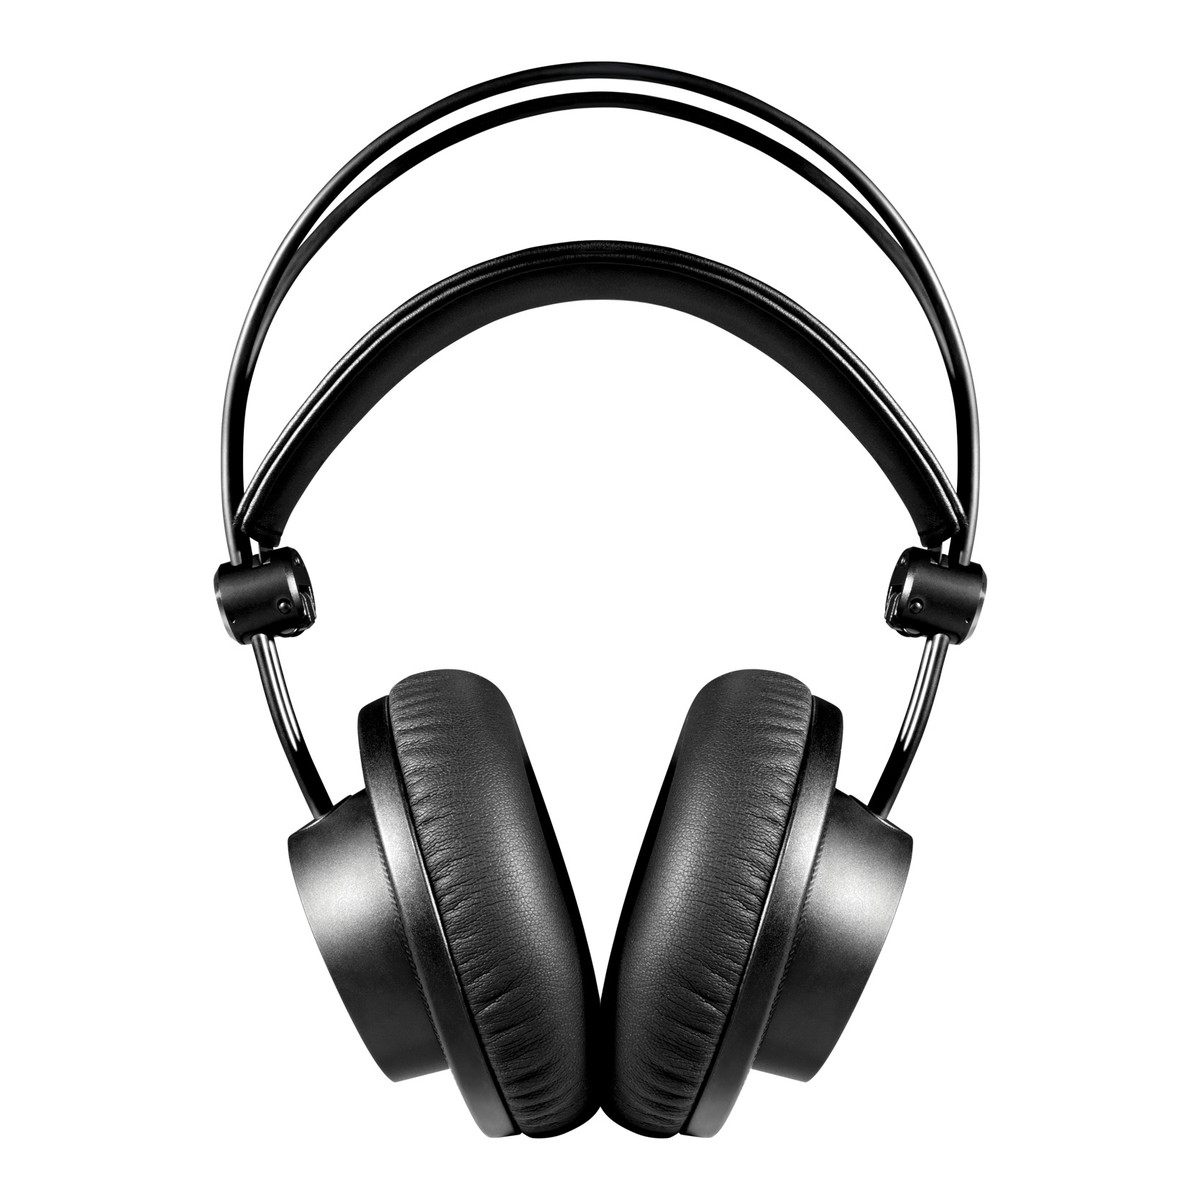 AKG K275 Headphones - Front. Loading zoom 7dc228c3202b